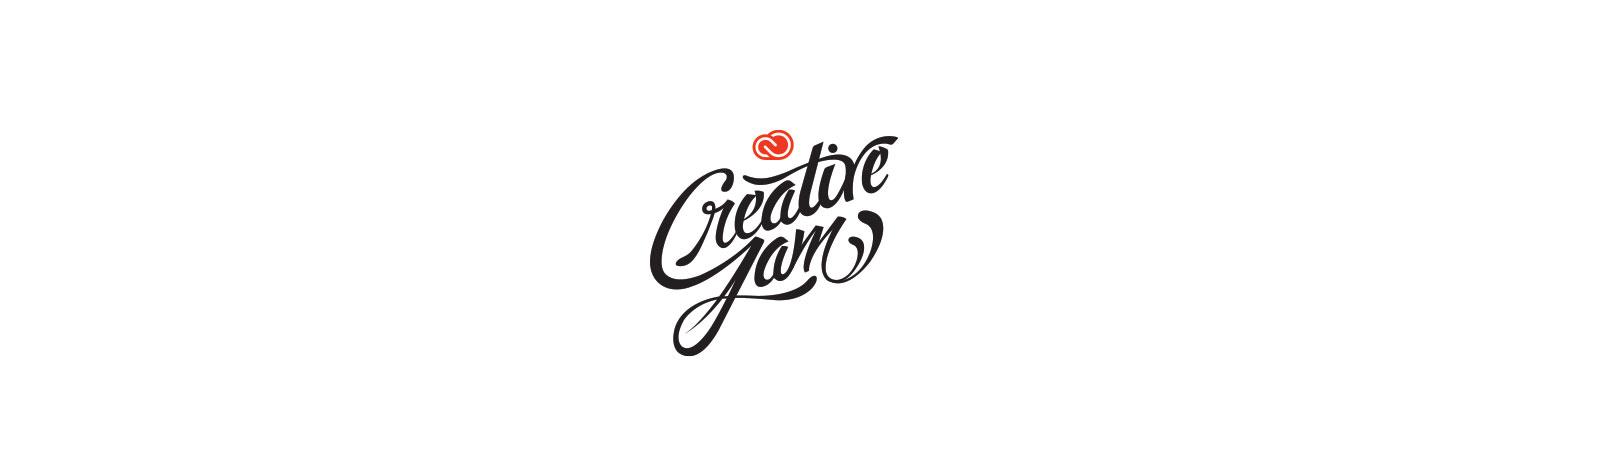 creative jam logo image